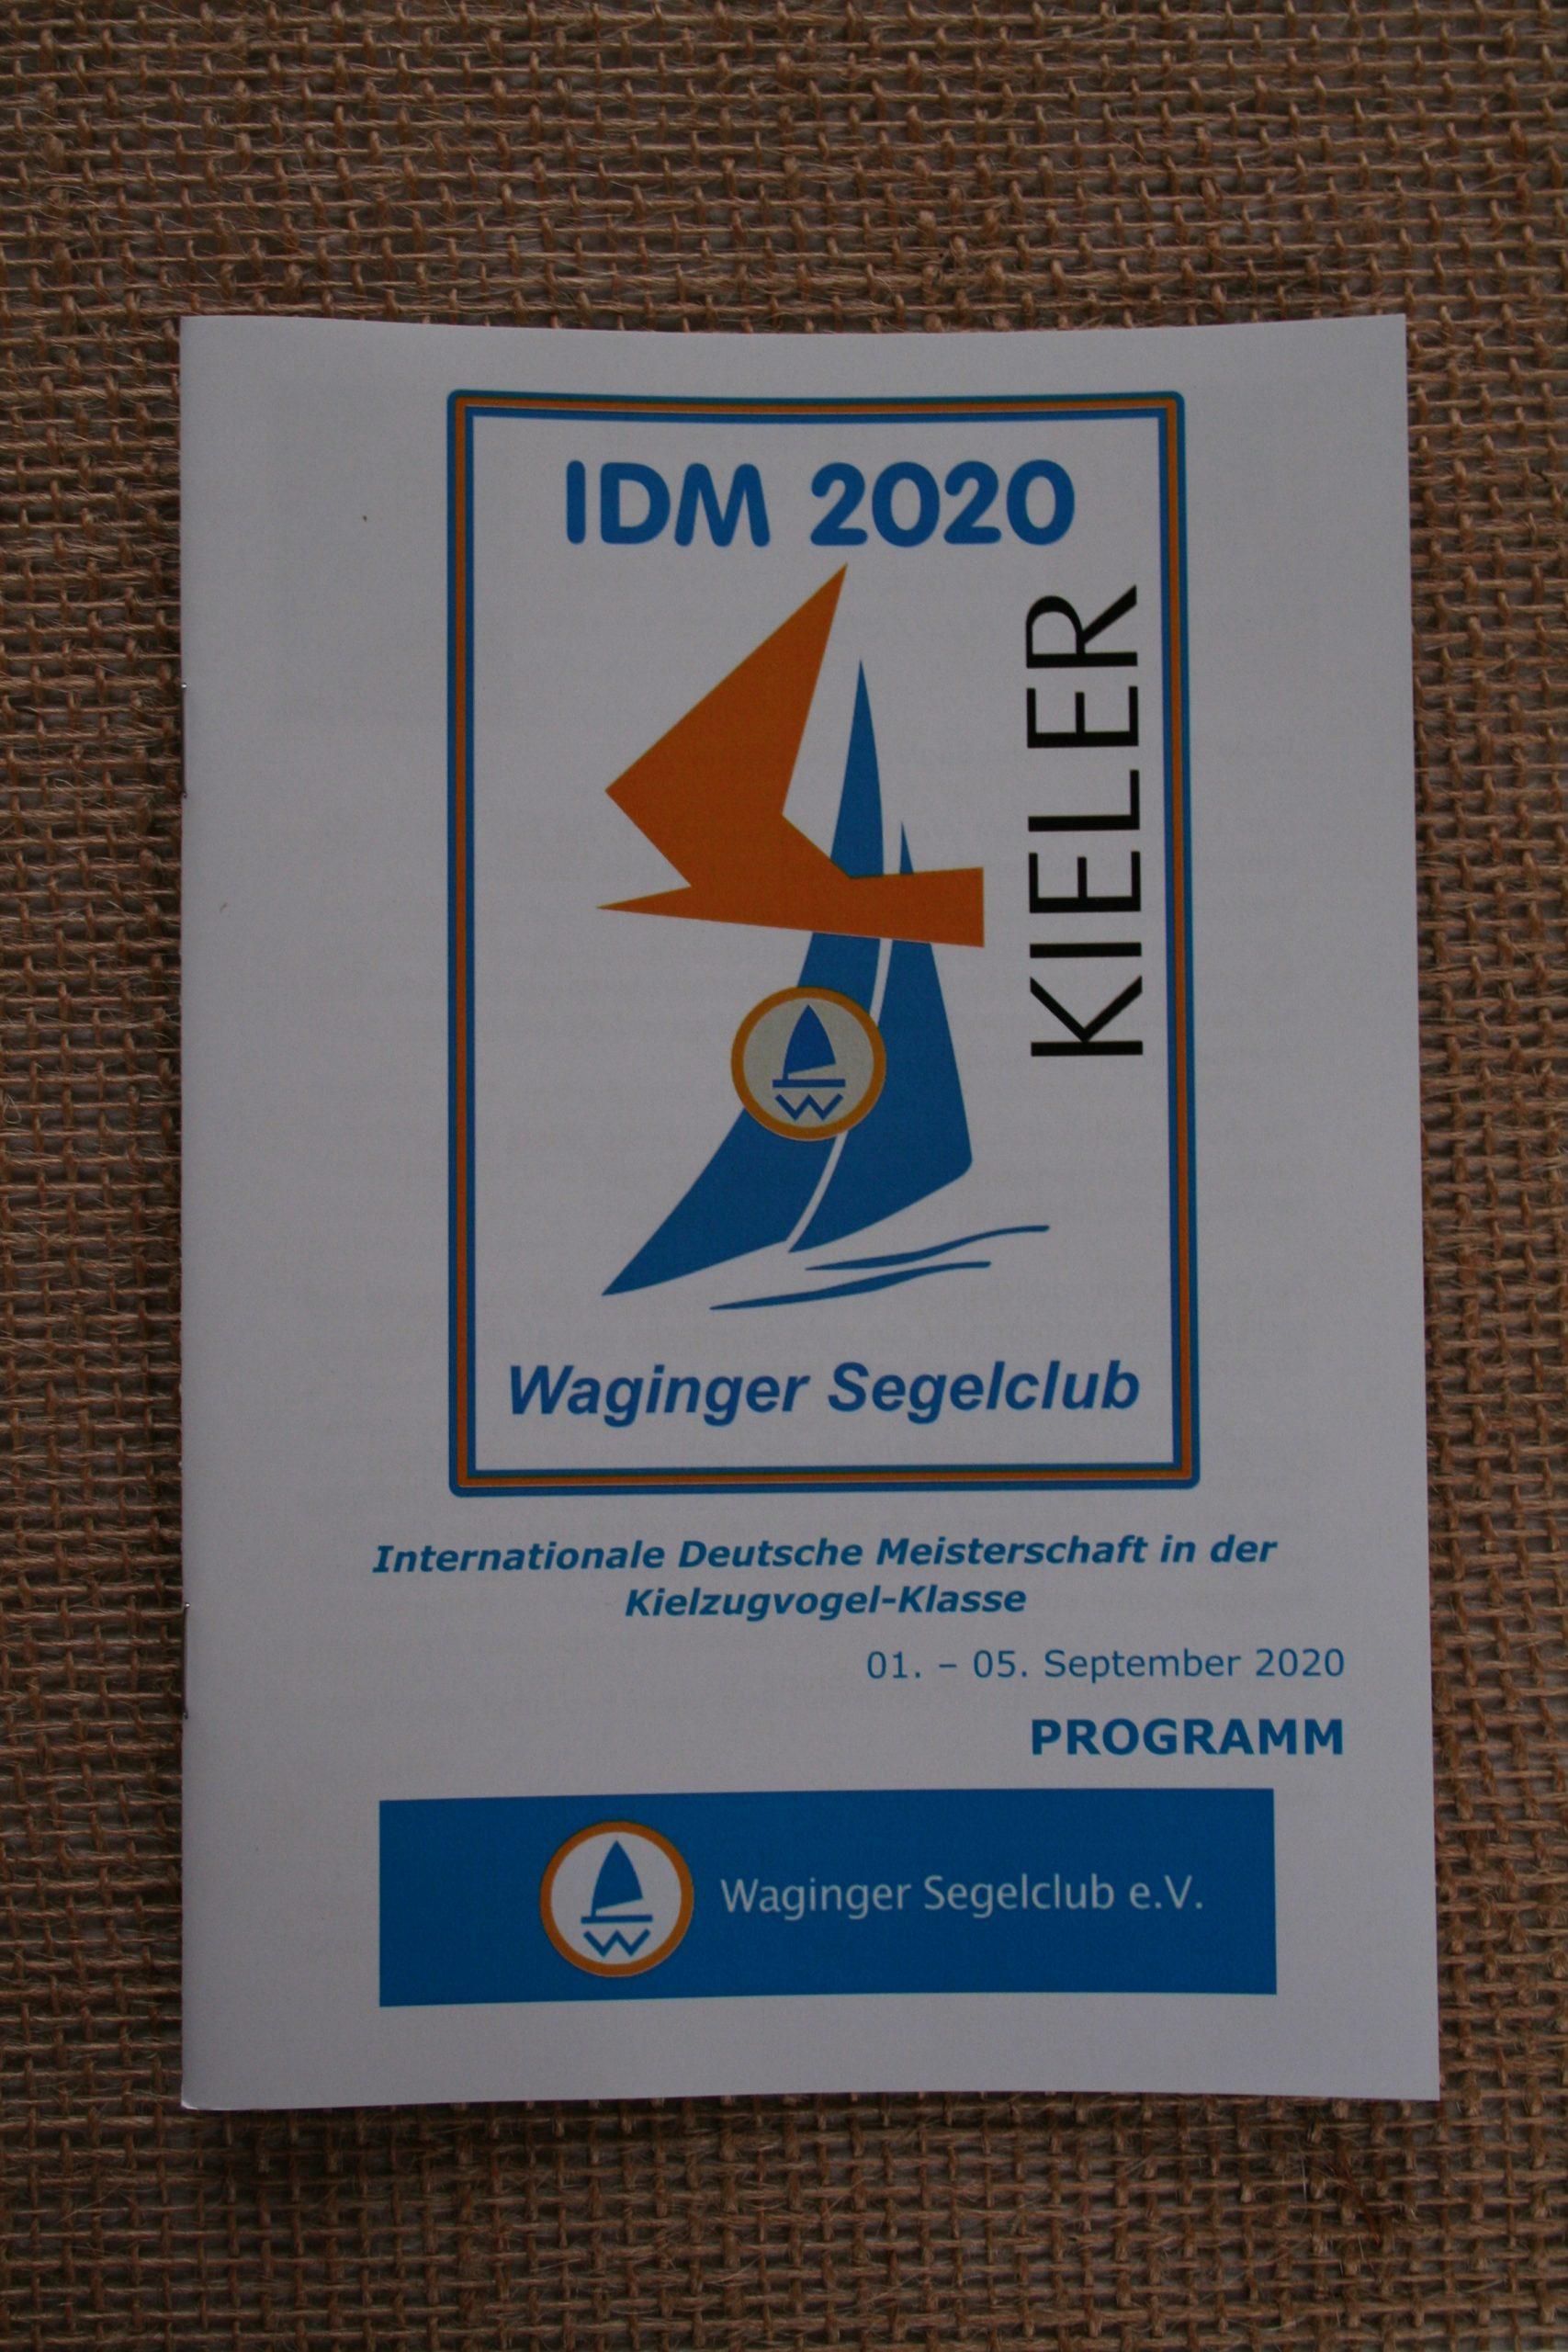 IDM_Waging_2020 (2)